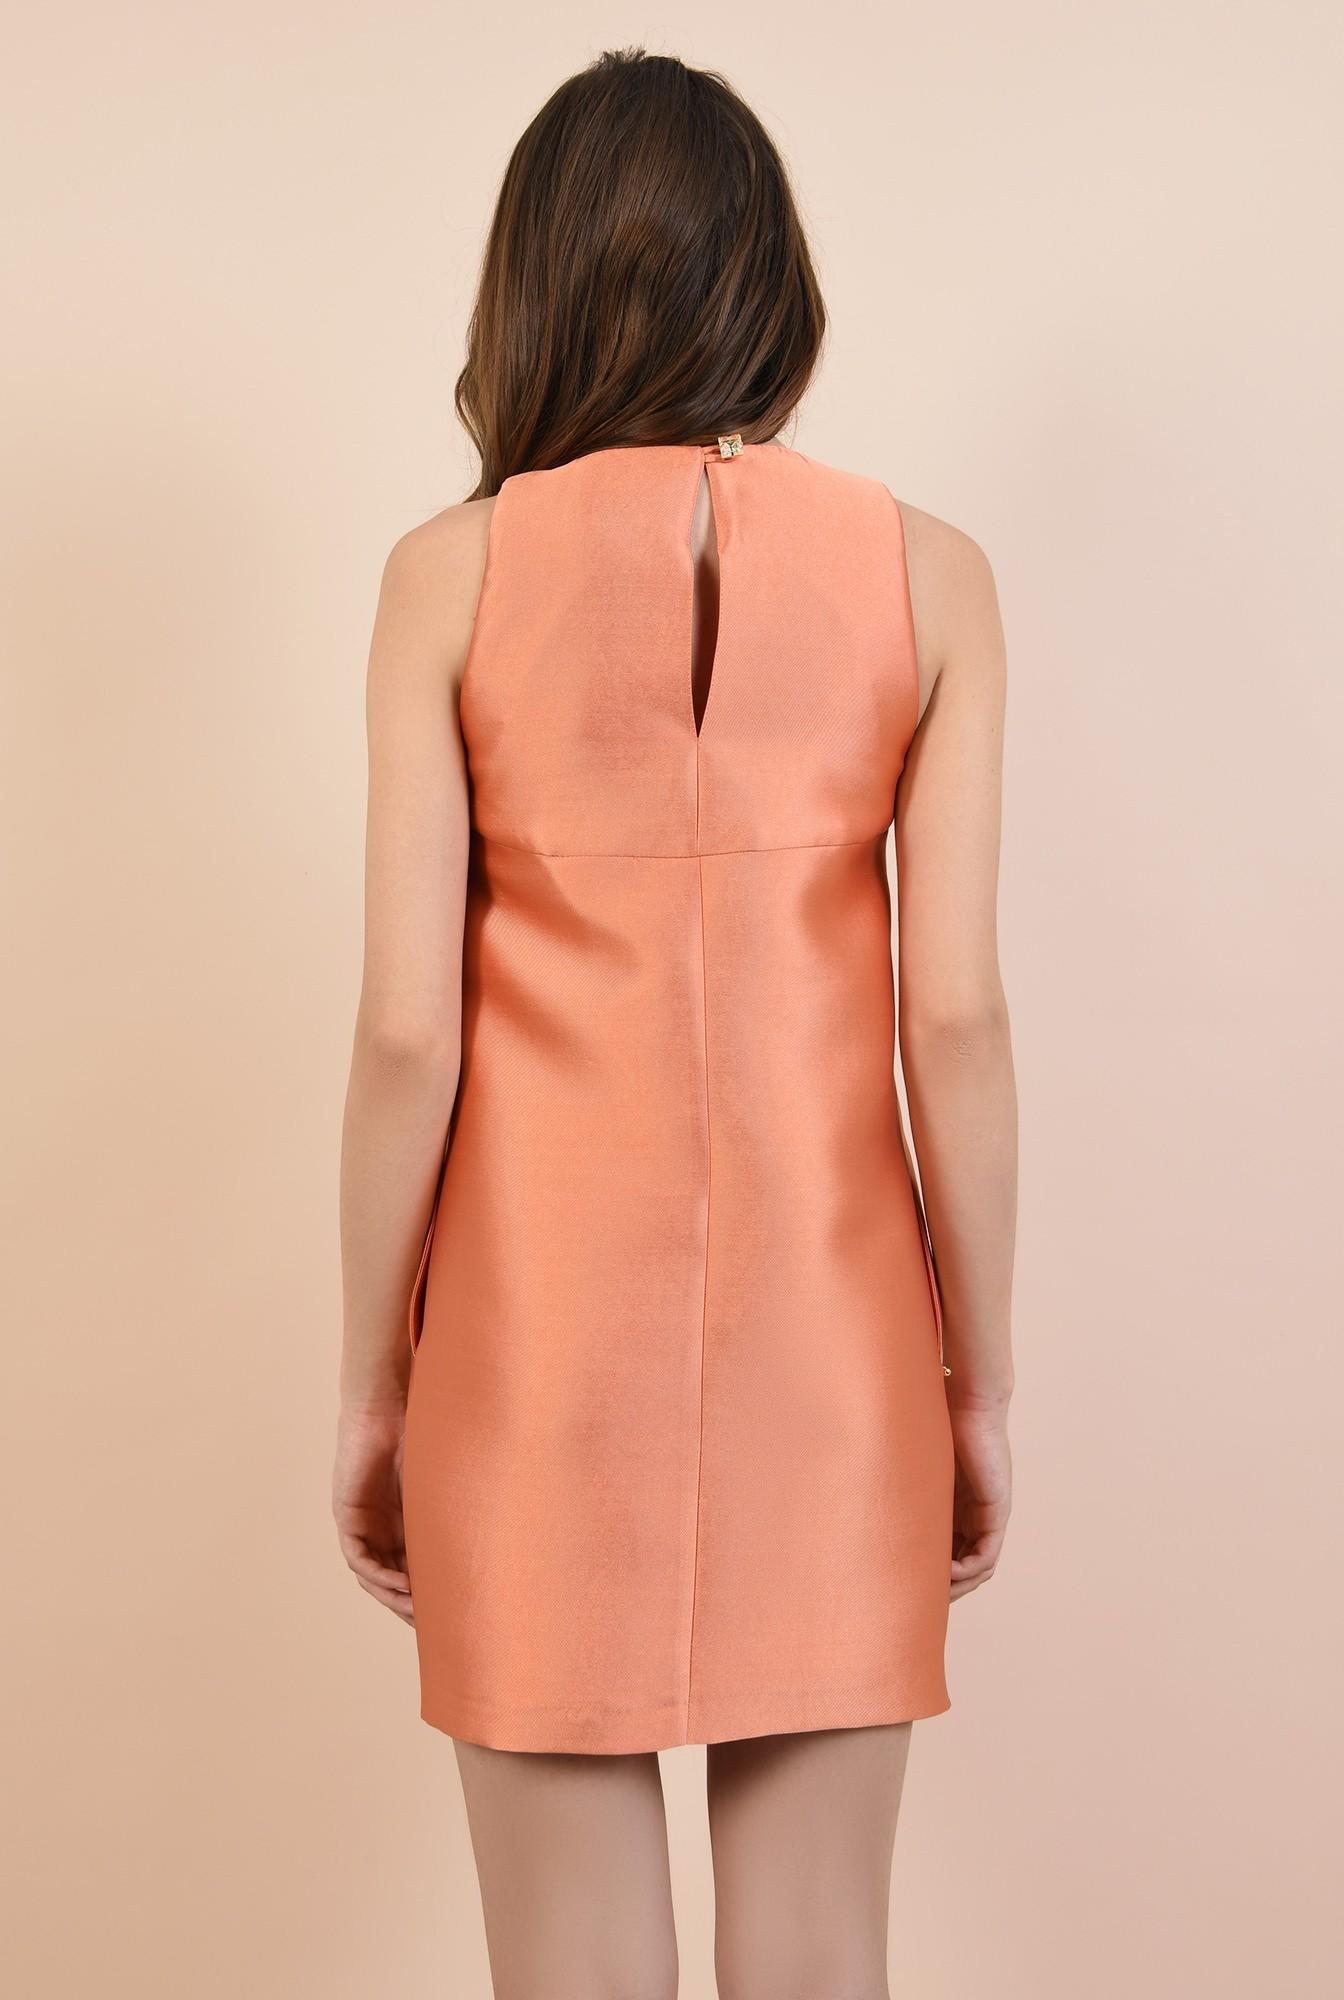 1 - rochie eleganta, mini, lejera, pliu decorativ, fara maneci, decolteu la baza gatului